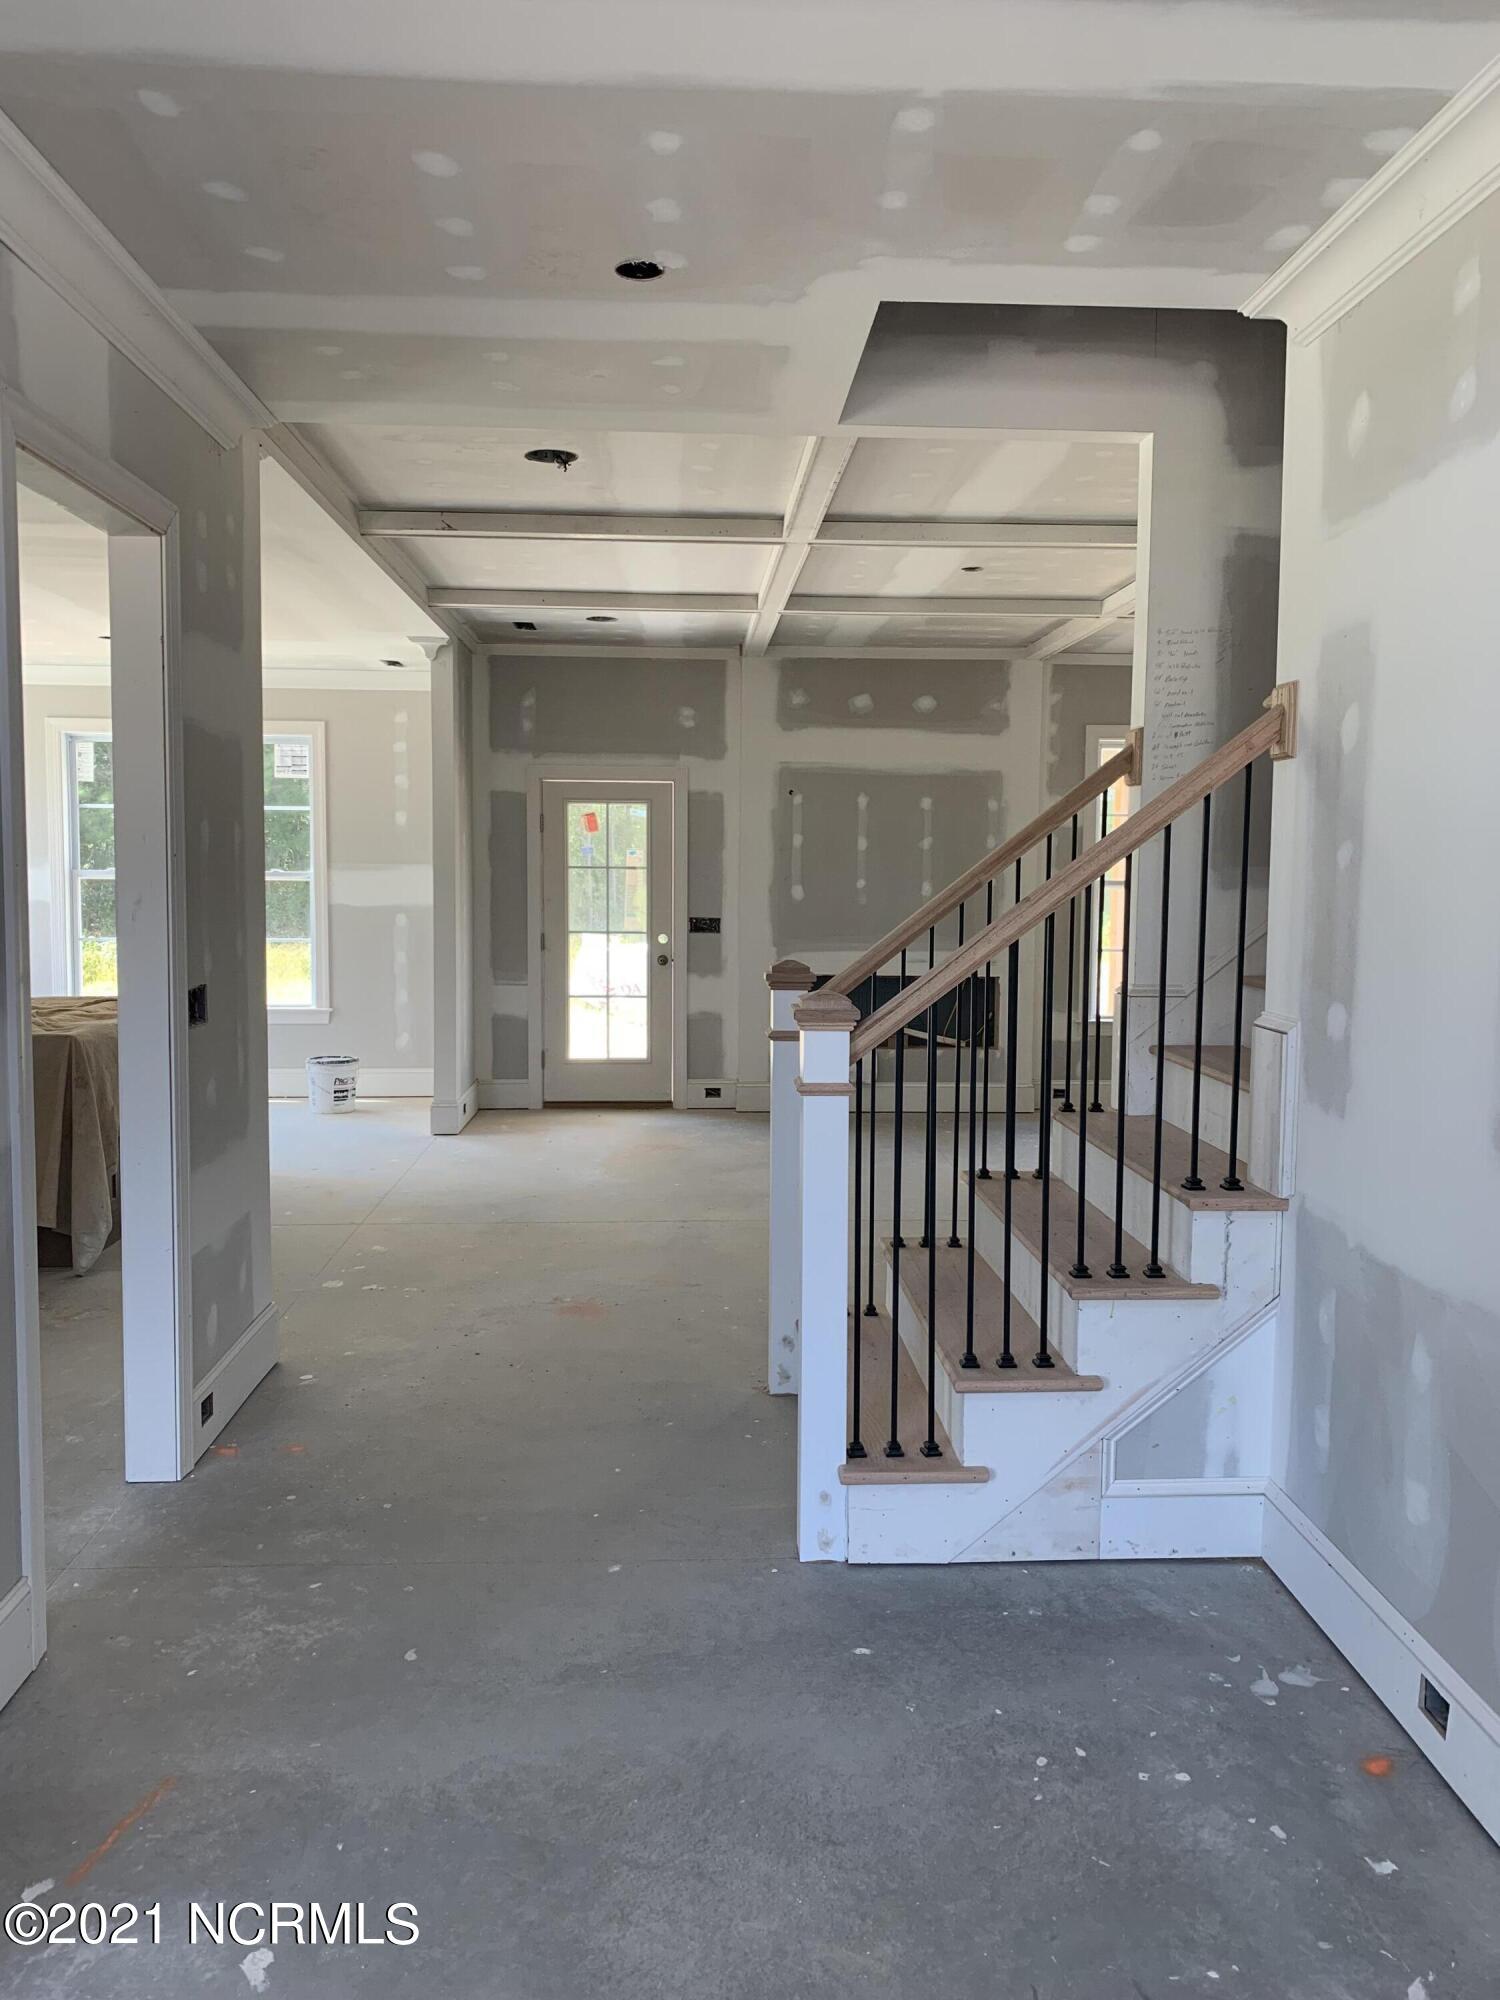 617 Megan Drive, Greenville, North Carolina 27834, 4 Bedrooms Bedrooms, 10 Rooms Rooms,3 BathroomsBathrooms,Single family residence,For sale,Megan,100285139